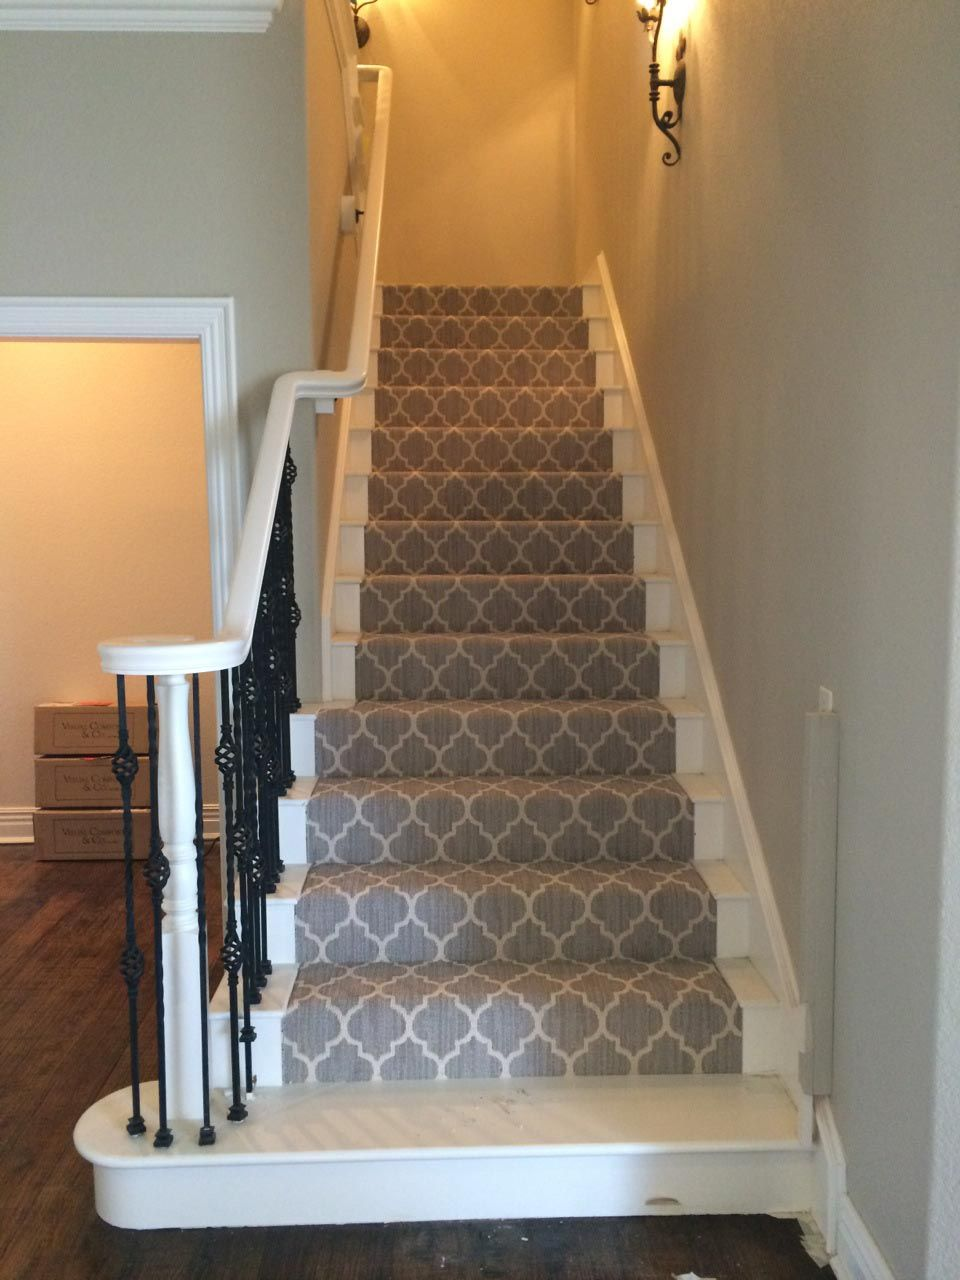 Narrow Stair Carpet Runners Carpet Stairs Stairs Design | Narrow Carpet Runners For Stairs